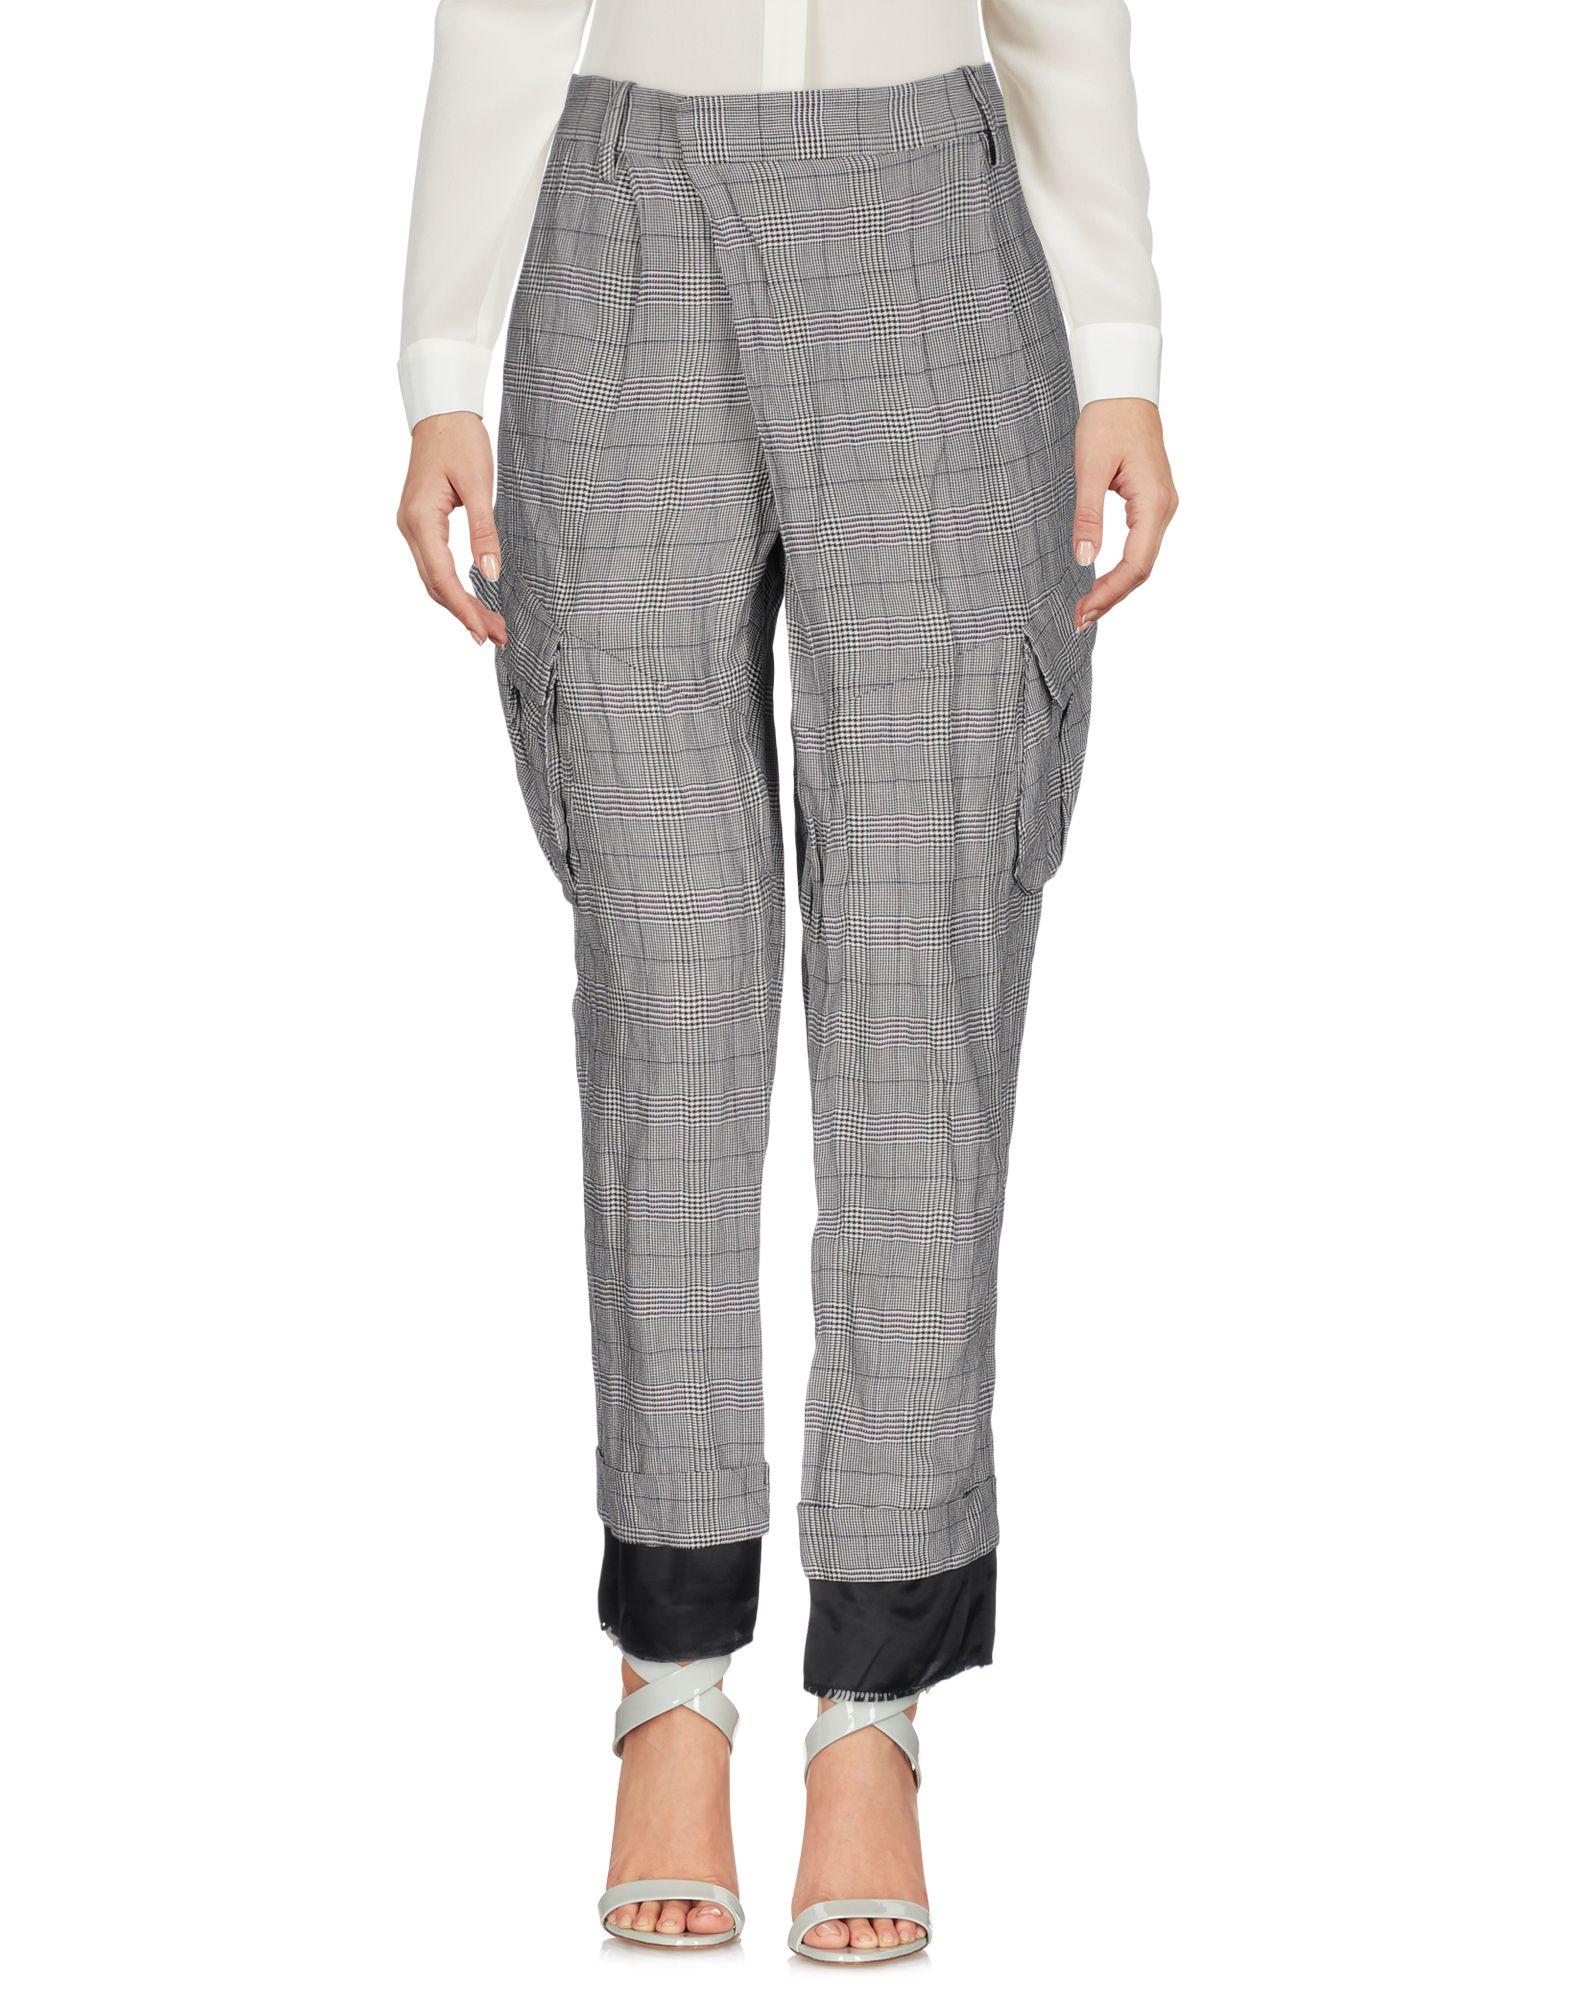 Pantalone A.F.Vandevorst Donna - Acquista online su 5mRorkeRci